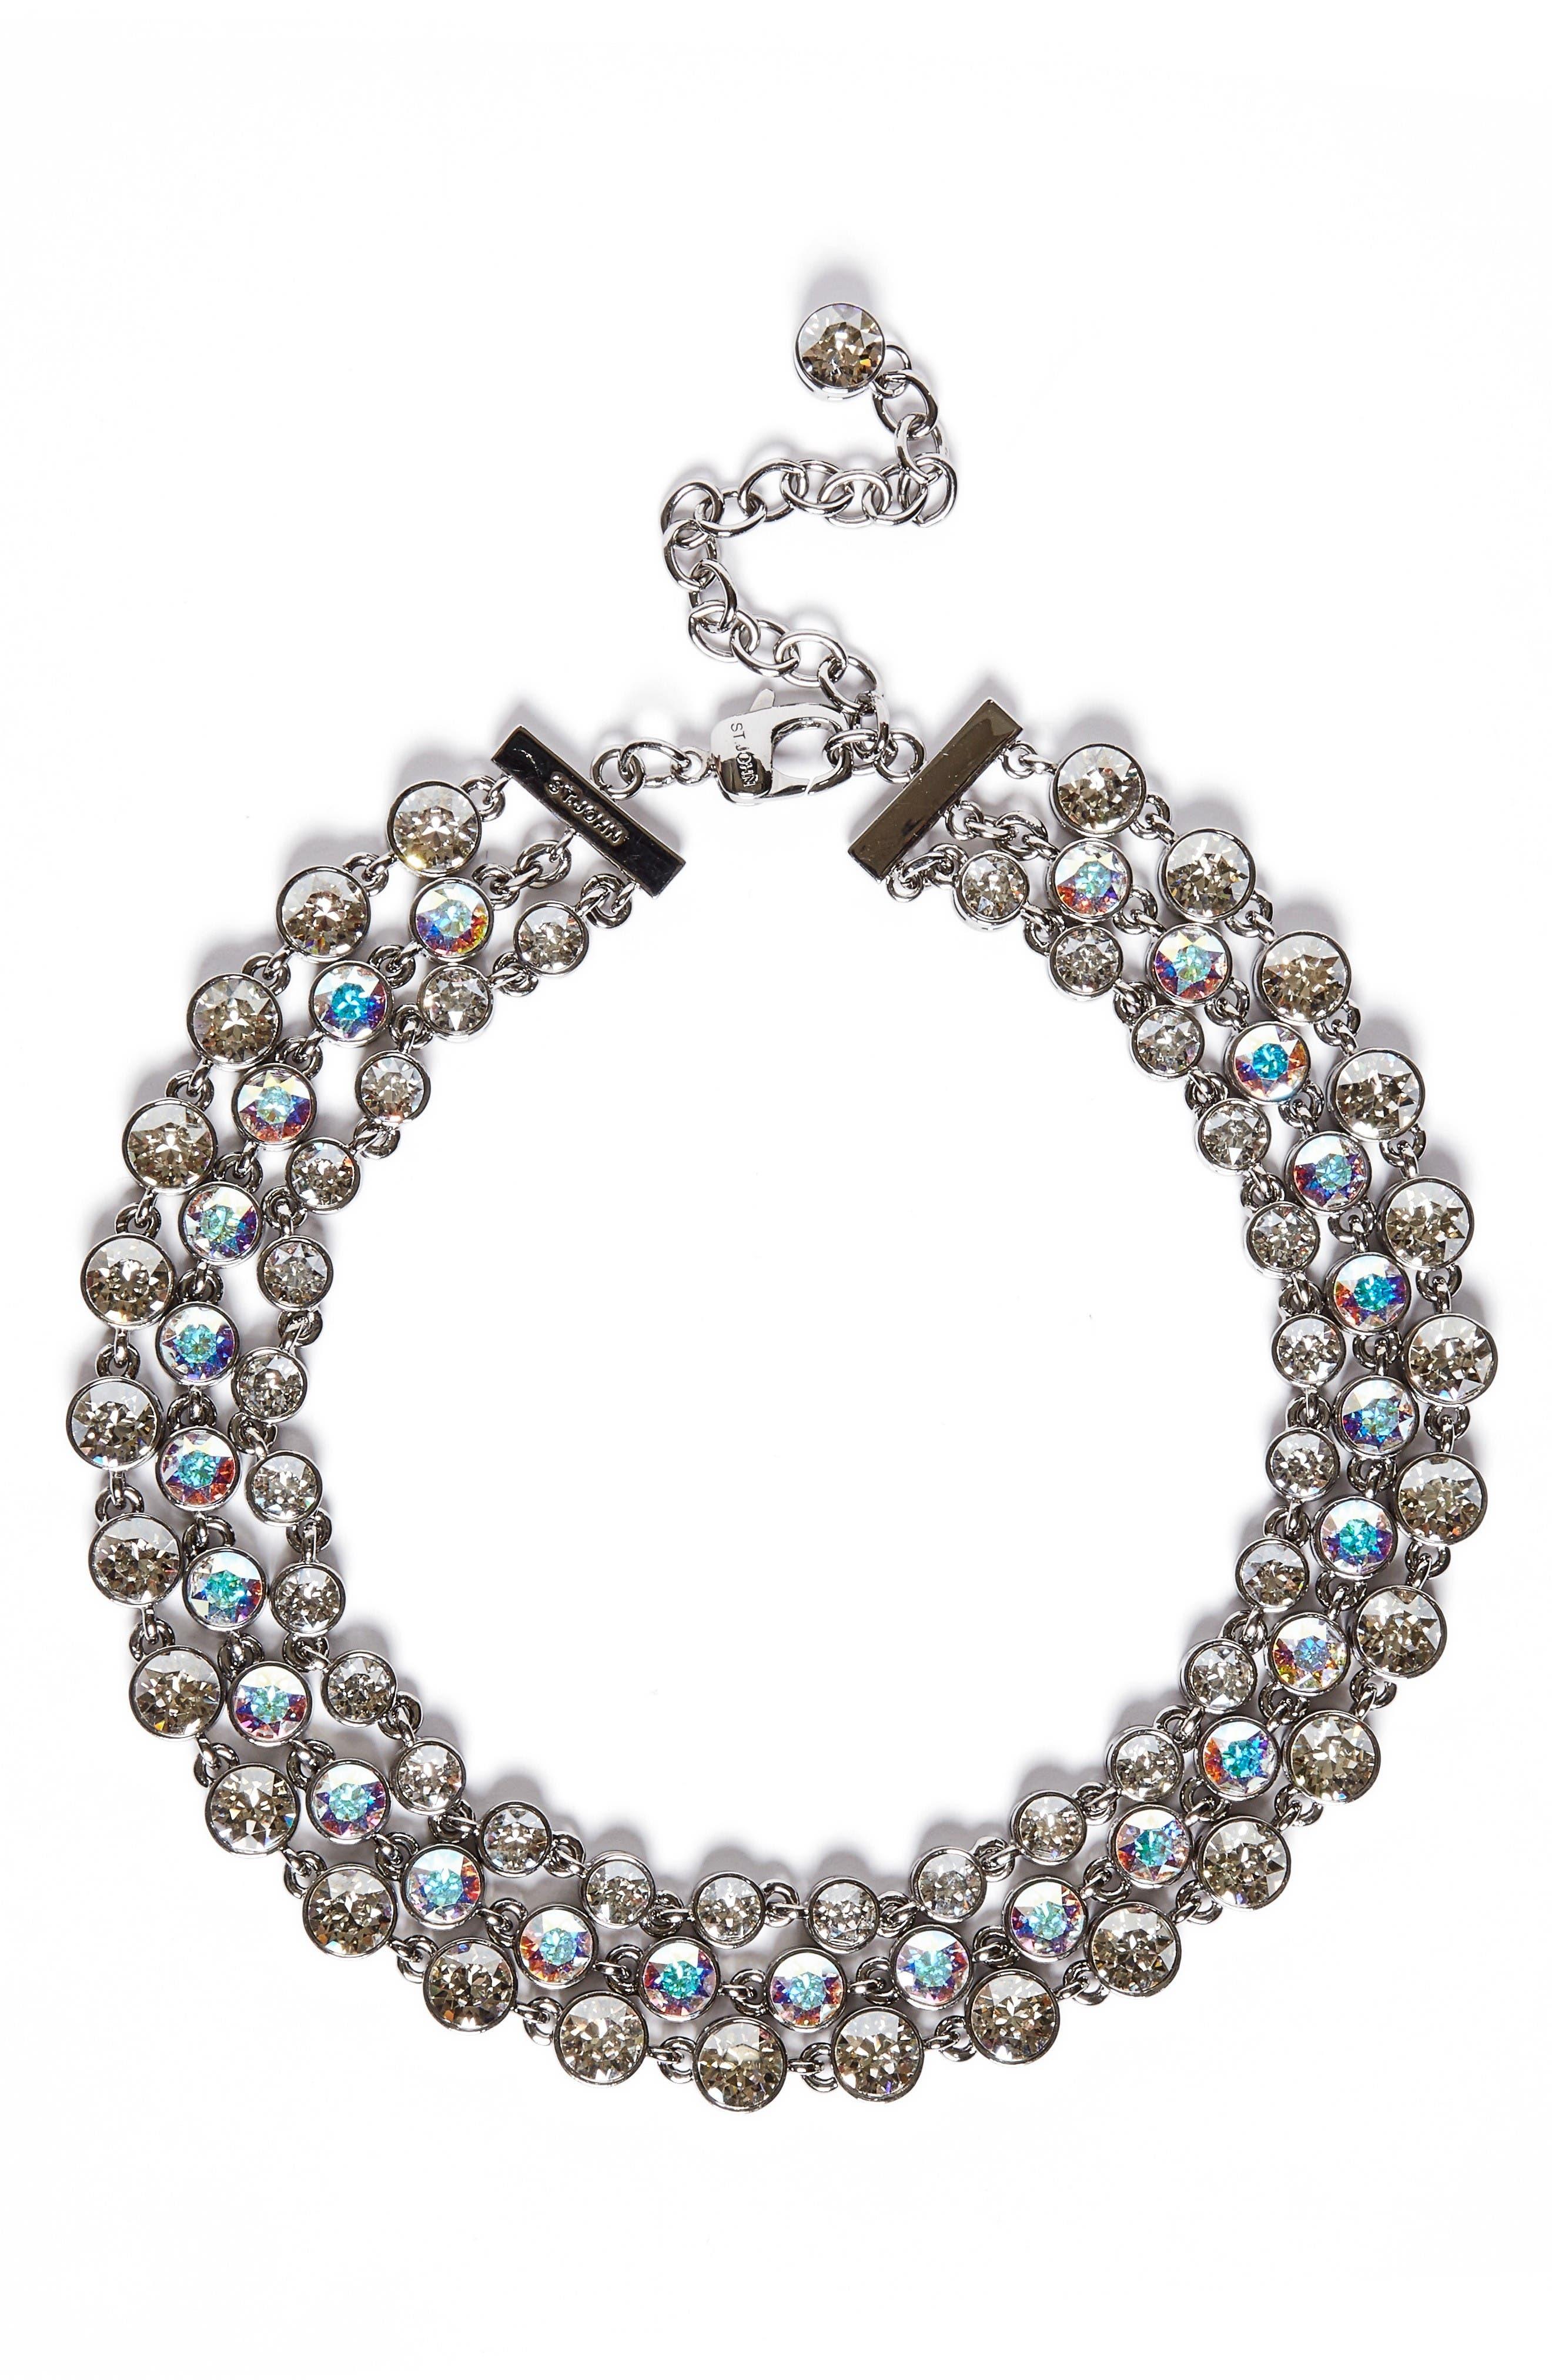 Swarovski Crystal Collar Necklace,                         Main,                         color, Ruthenium/ Crystal